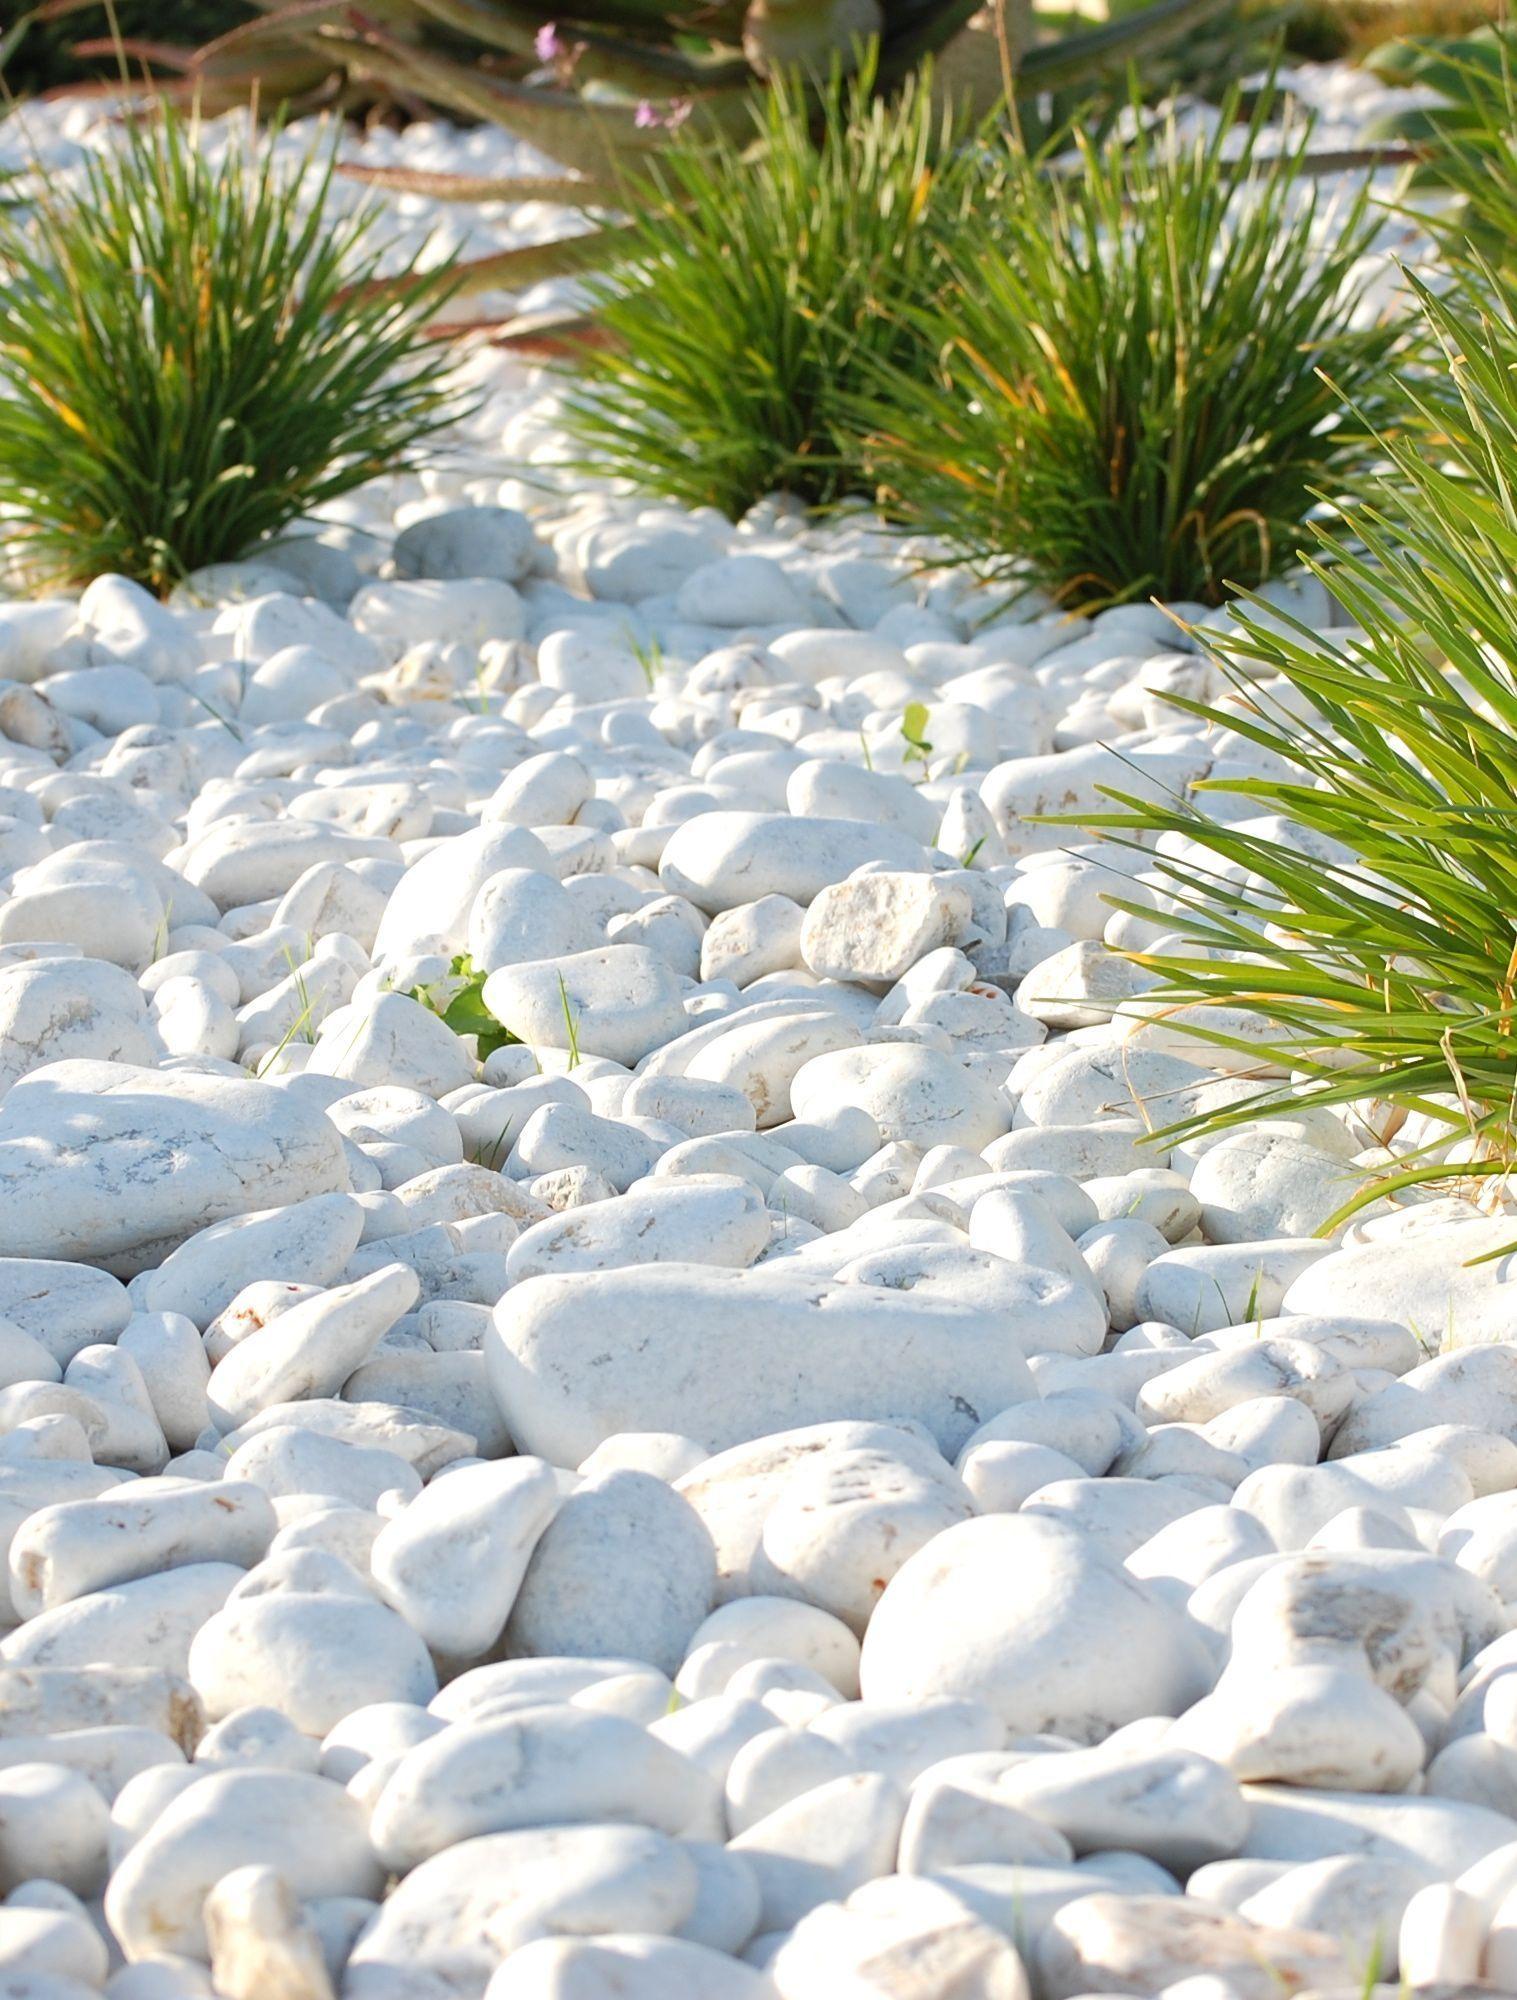 Pin By Cerina Kopp On Backyard In 2020 Landscaping With Rocks